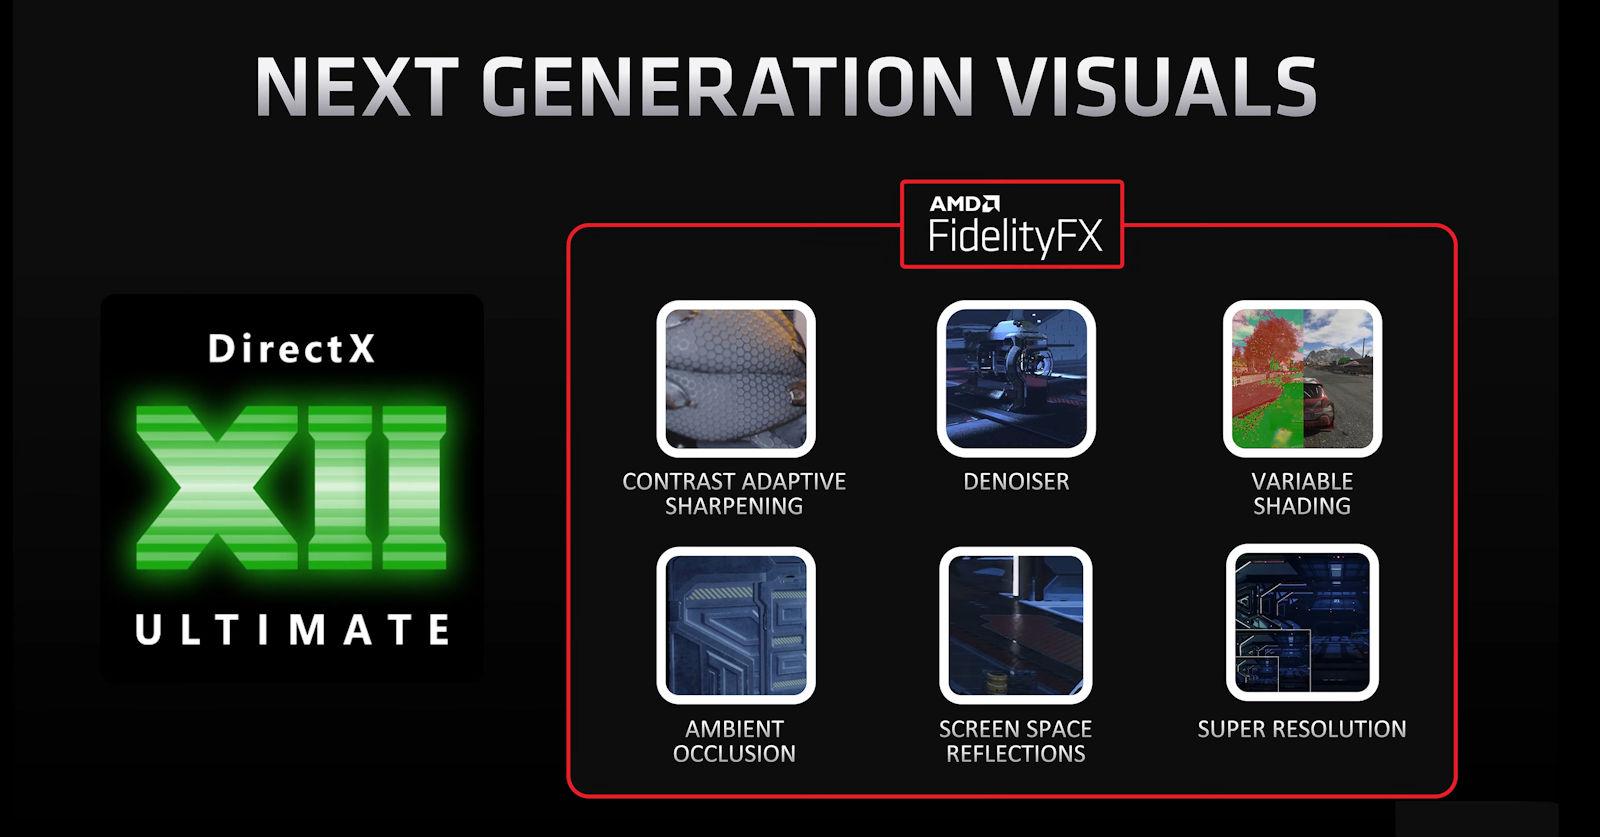 AMD's supersampling feature